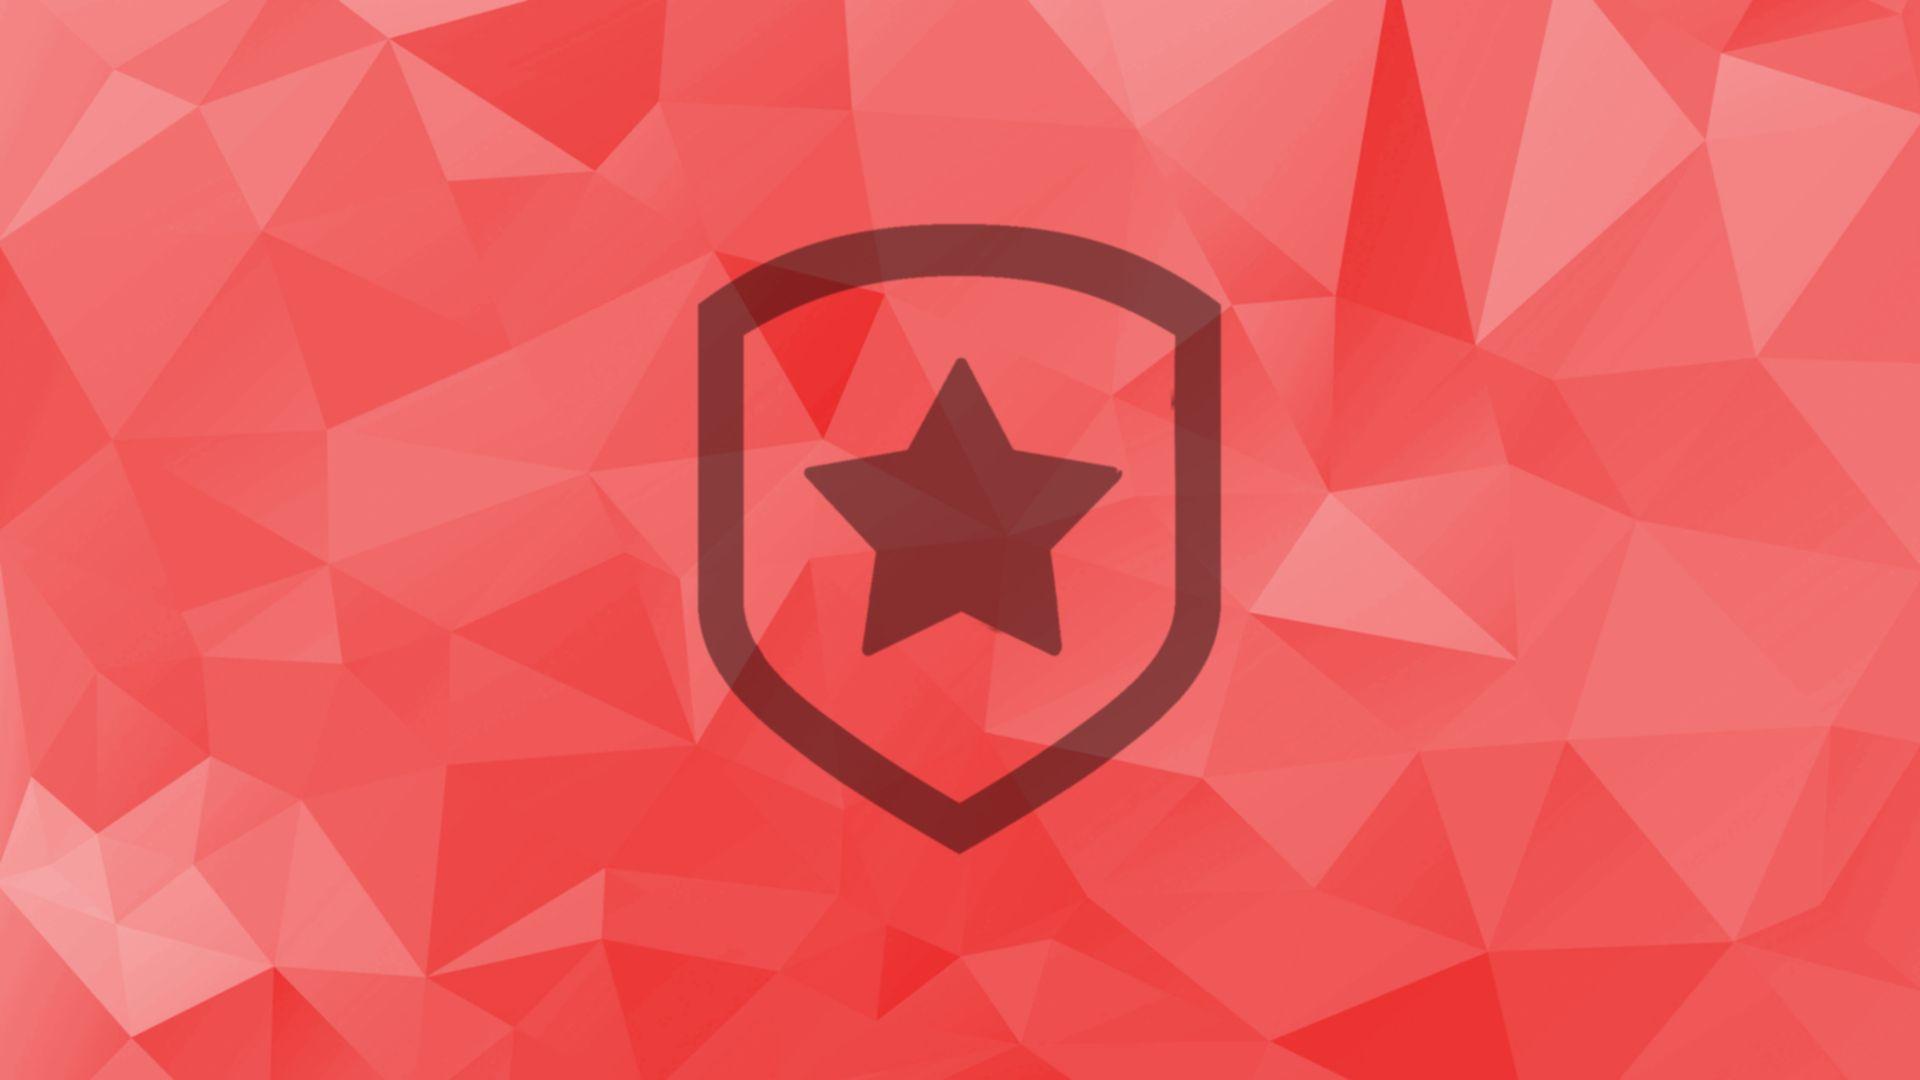 Razer Gaming Abstract Red Live Wallpaper | Gambit gaming ...